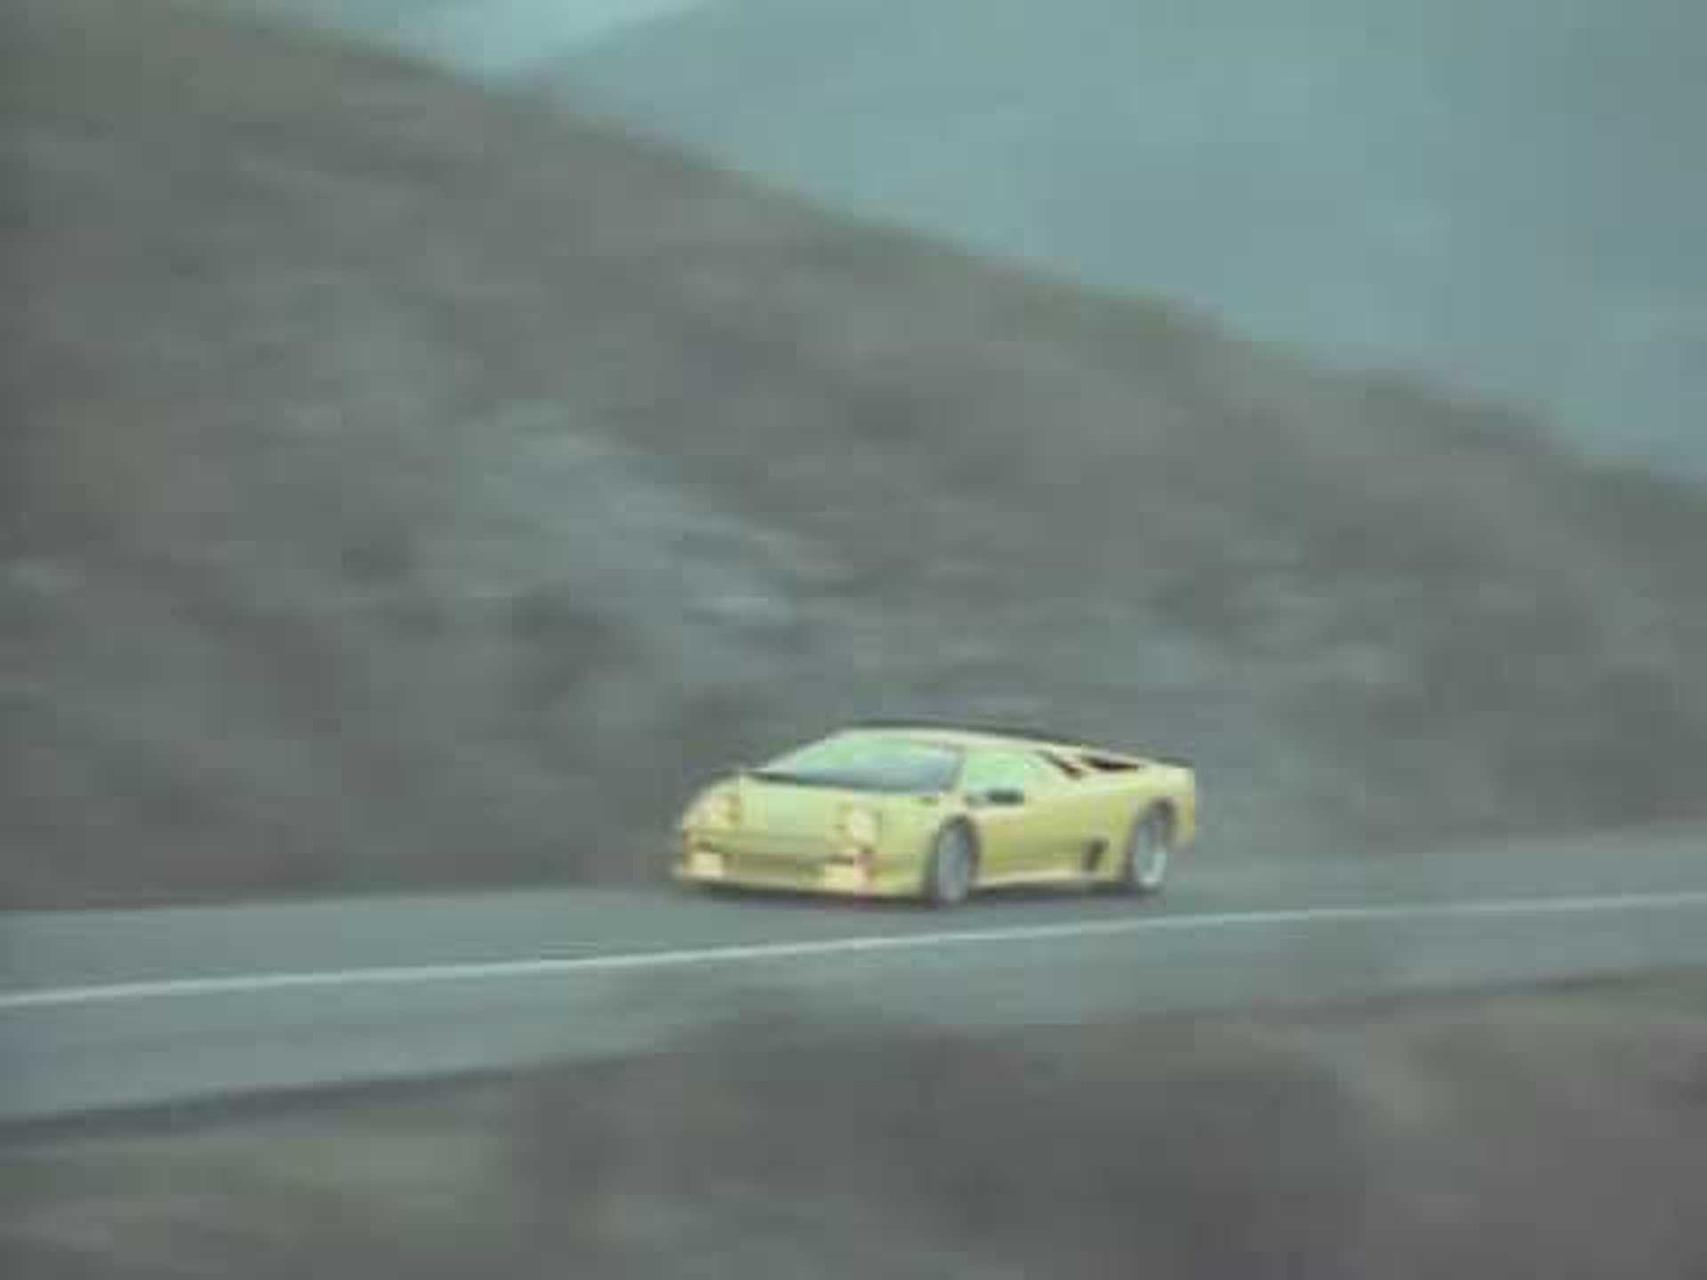 Supercars: Lamborghini Diablo